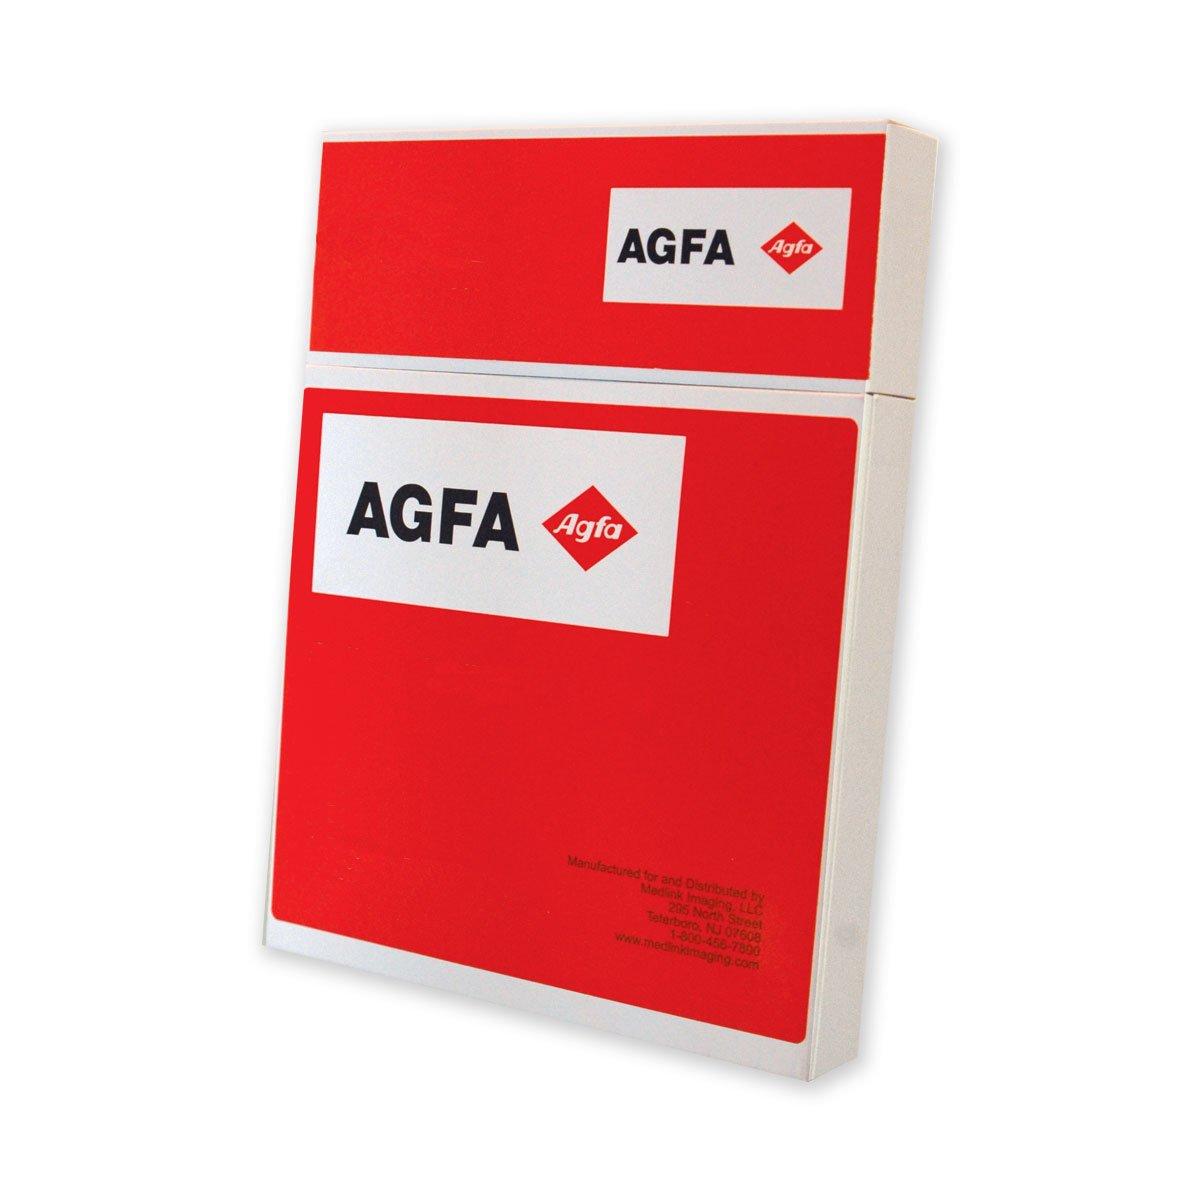 Image of X-Ray Film AGFA RADIOMAT PCB1012 X-Ray Film, Full Speed, 10' x 12', Blue Sensitive (Pack of 100)